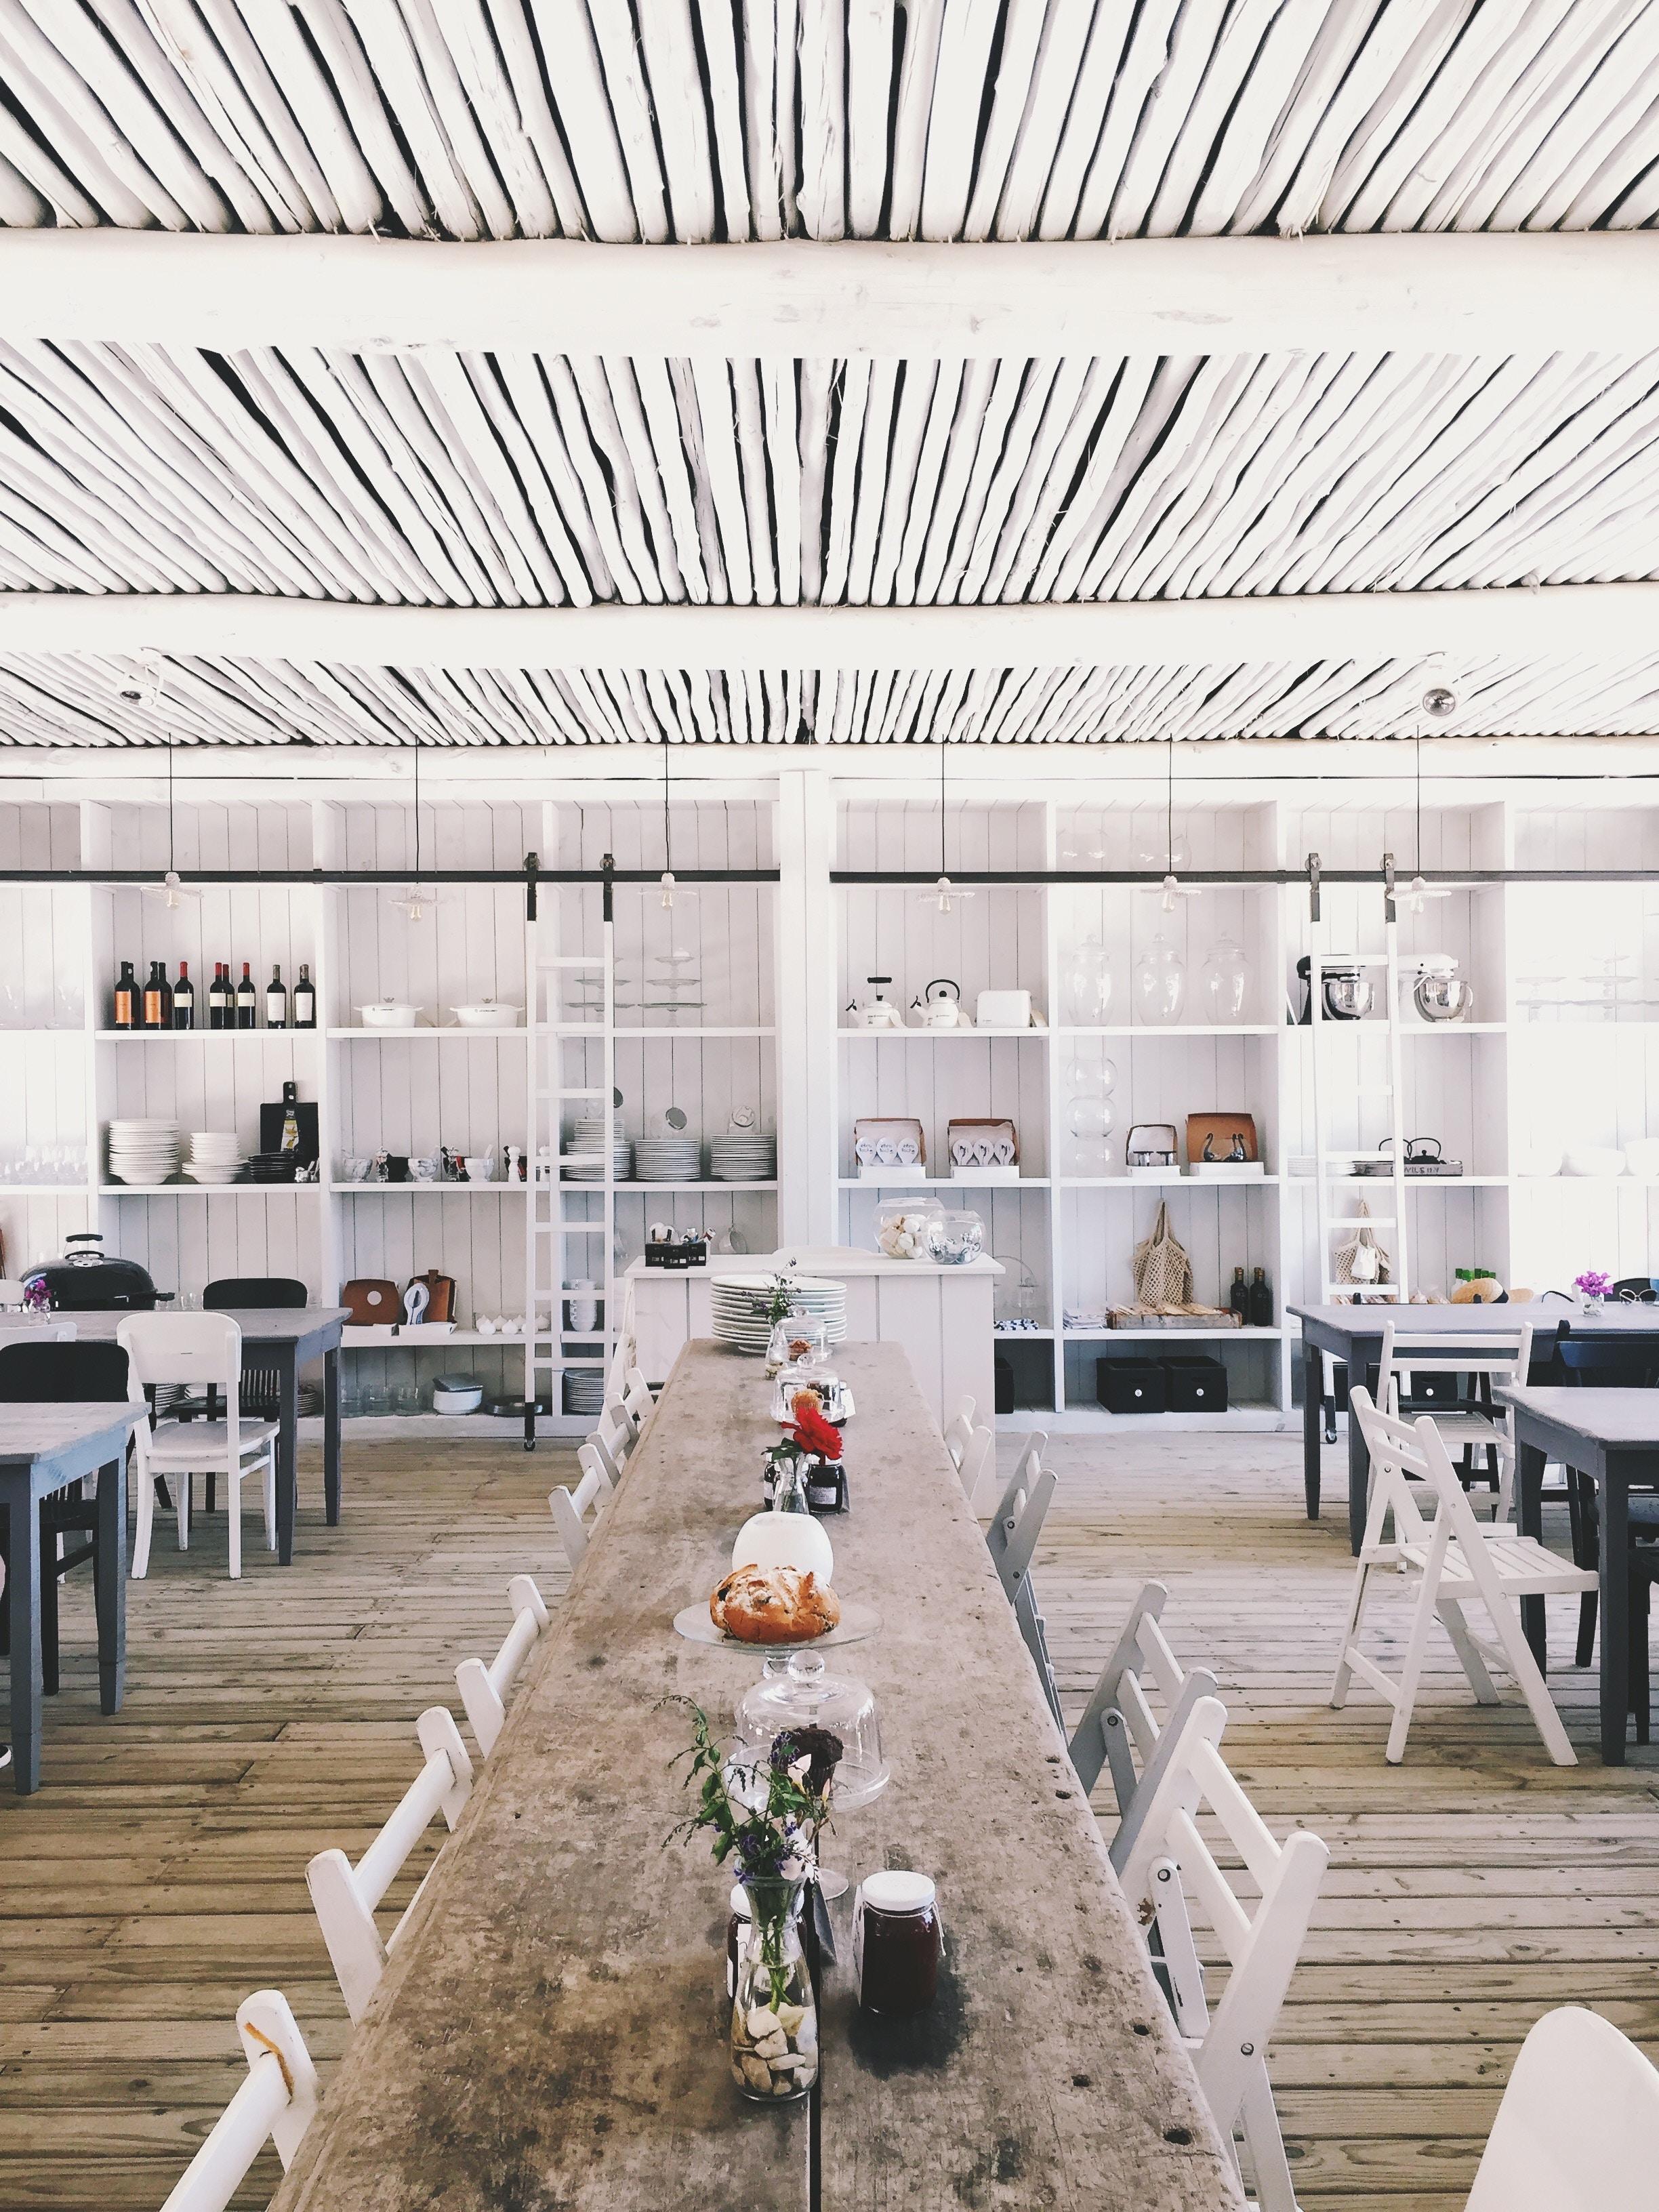 arredamento ristoranti 2019